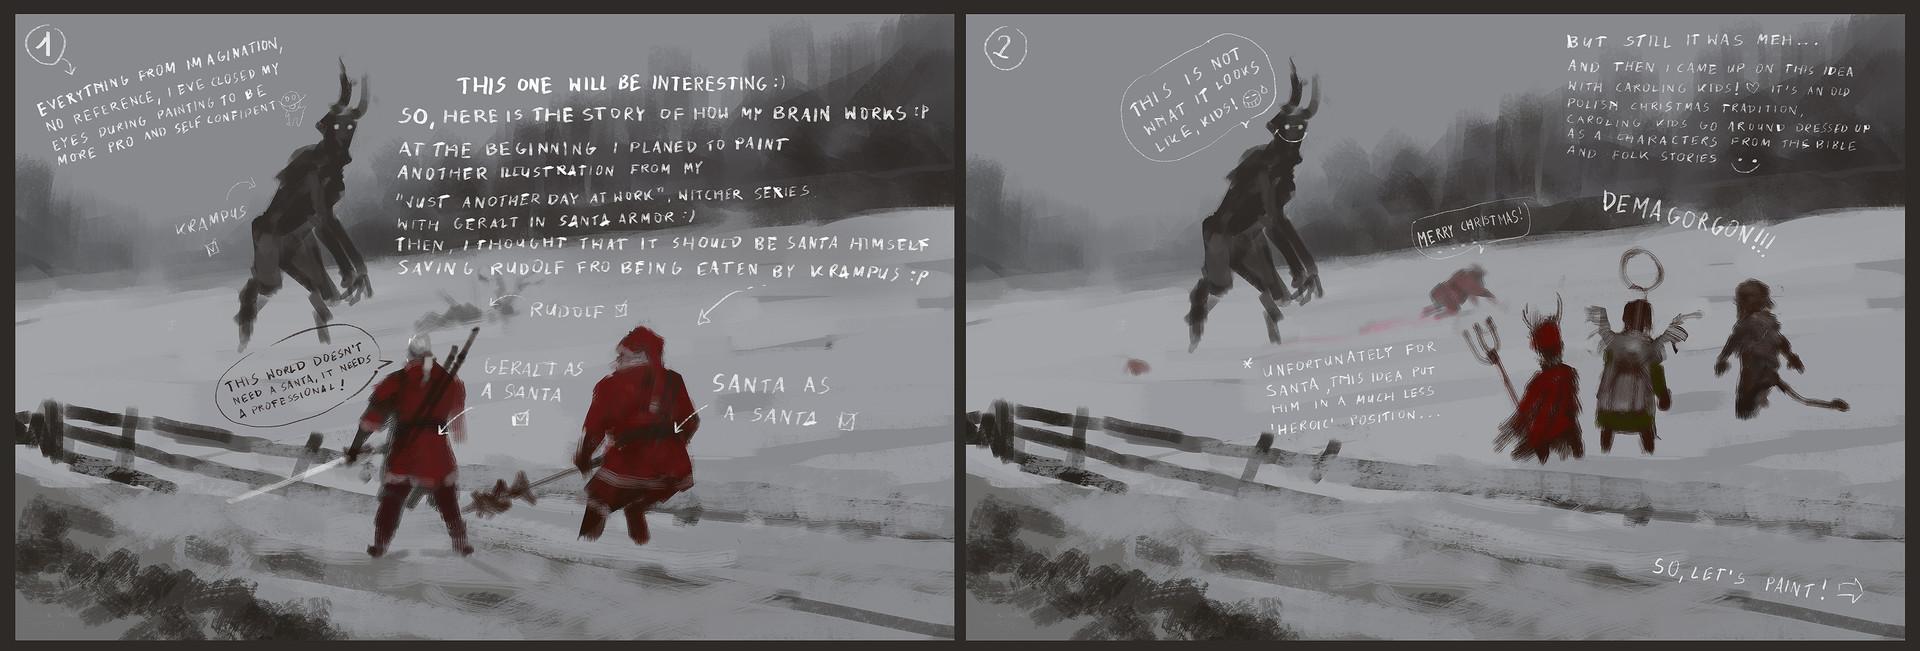 Jakub rozalski santa vs krampus process1